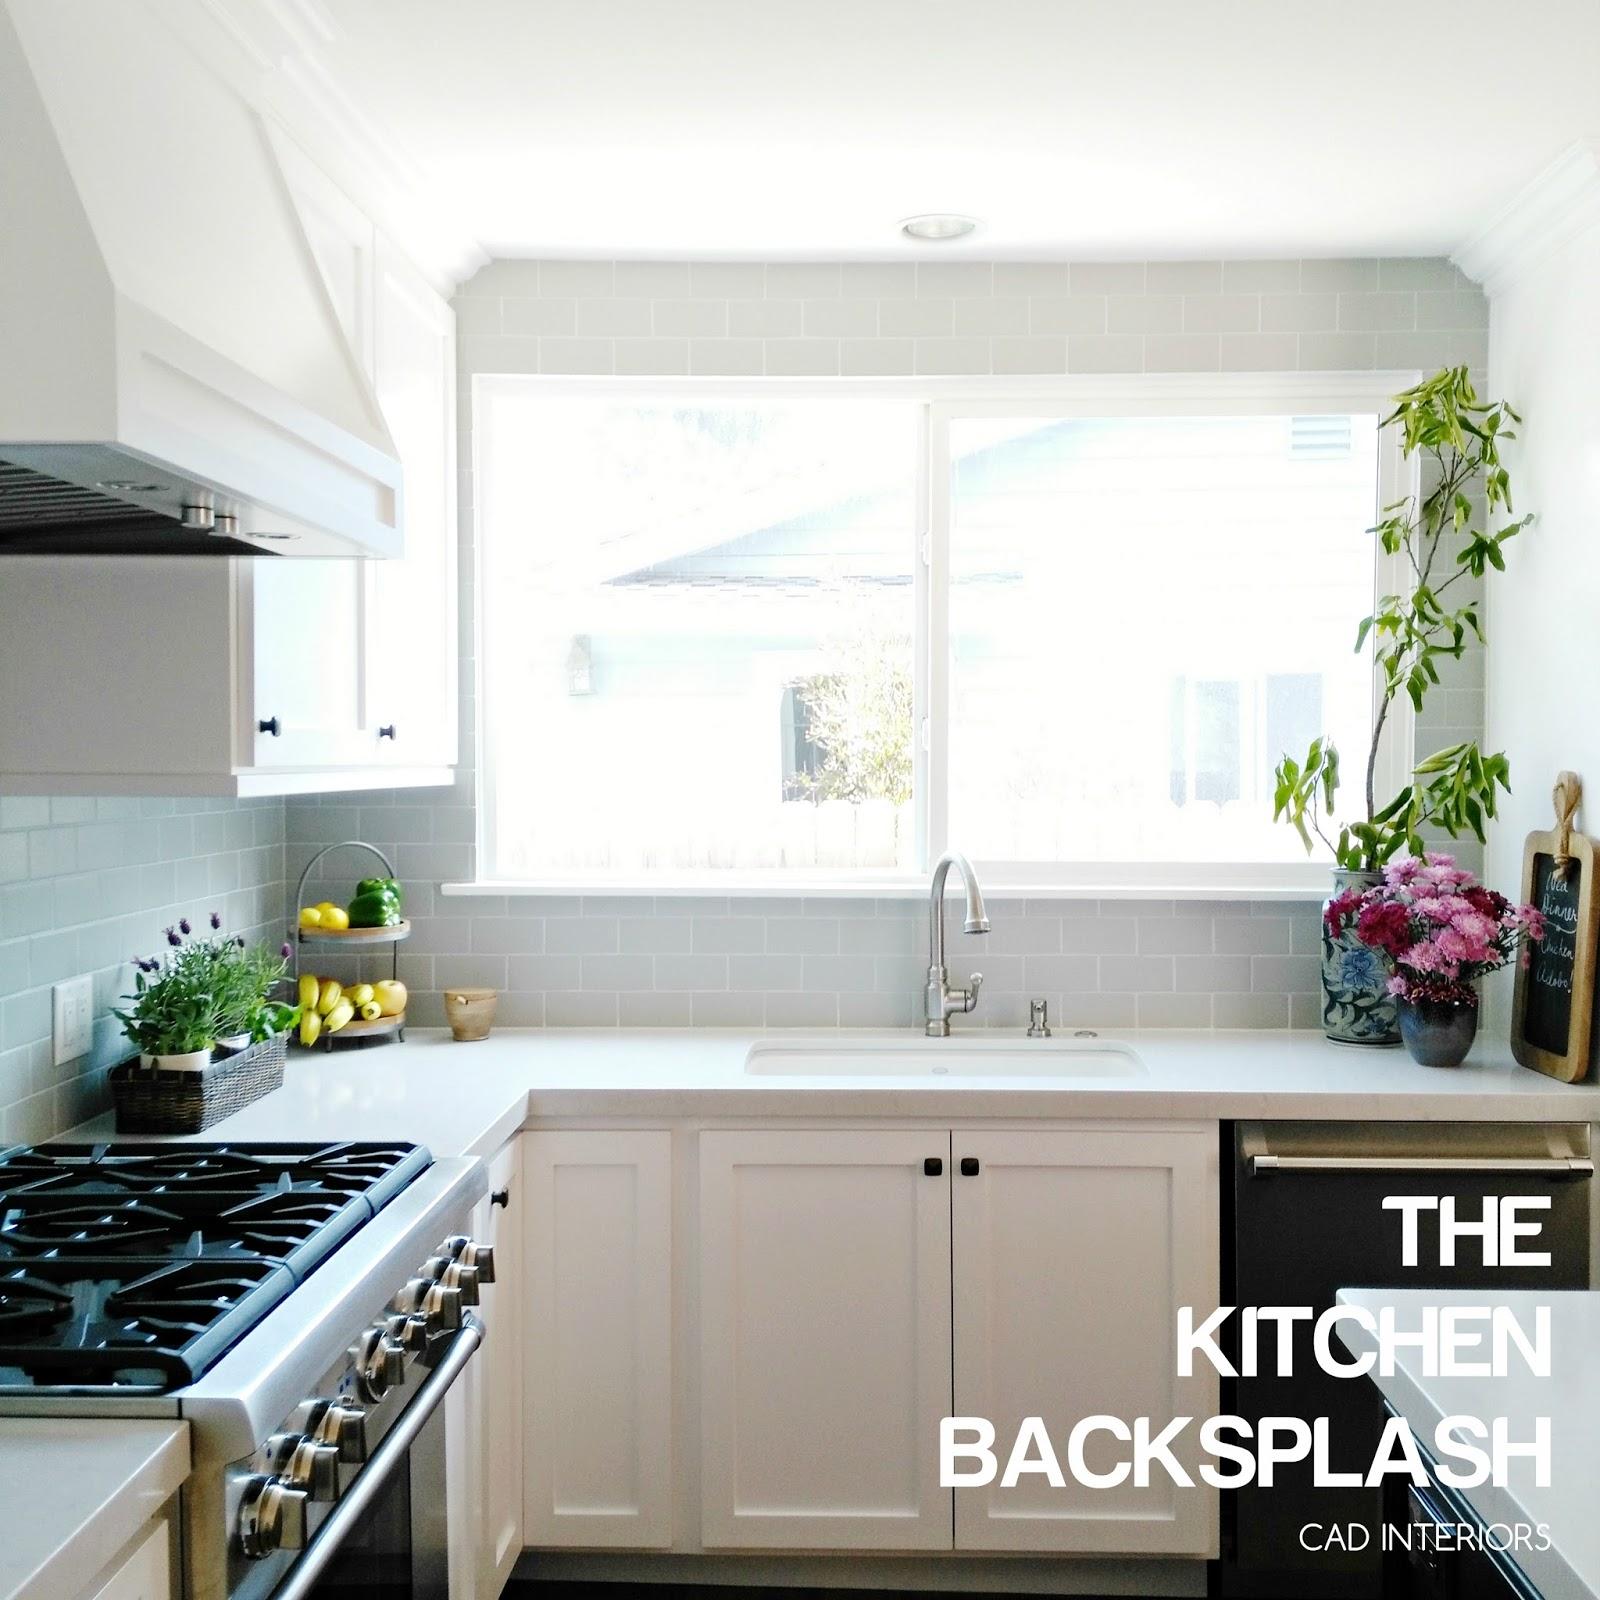 kitchen backsplash installing kitchen backsplash ceramic subway tile backsplash modern classic farmhouse kitchen design